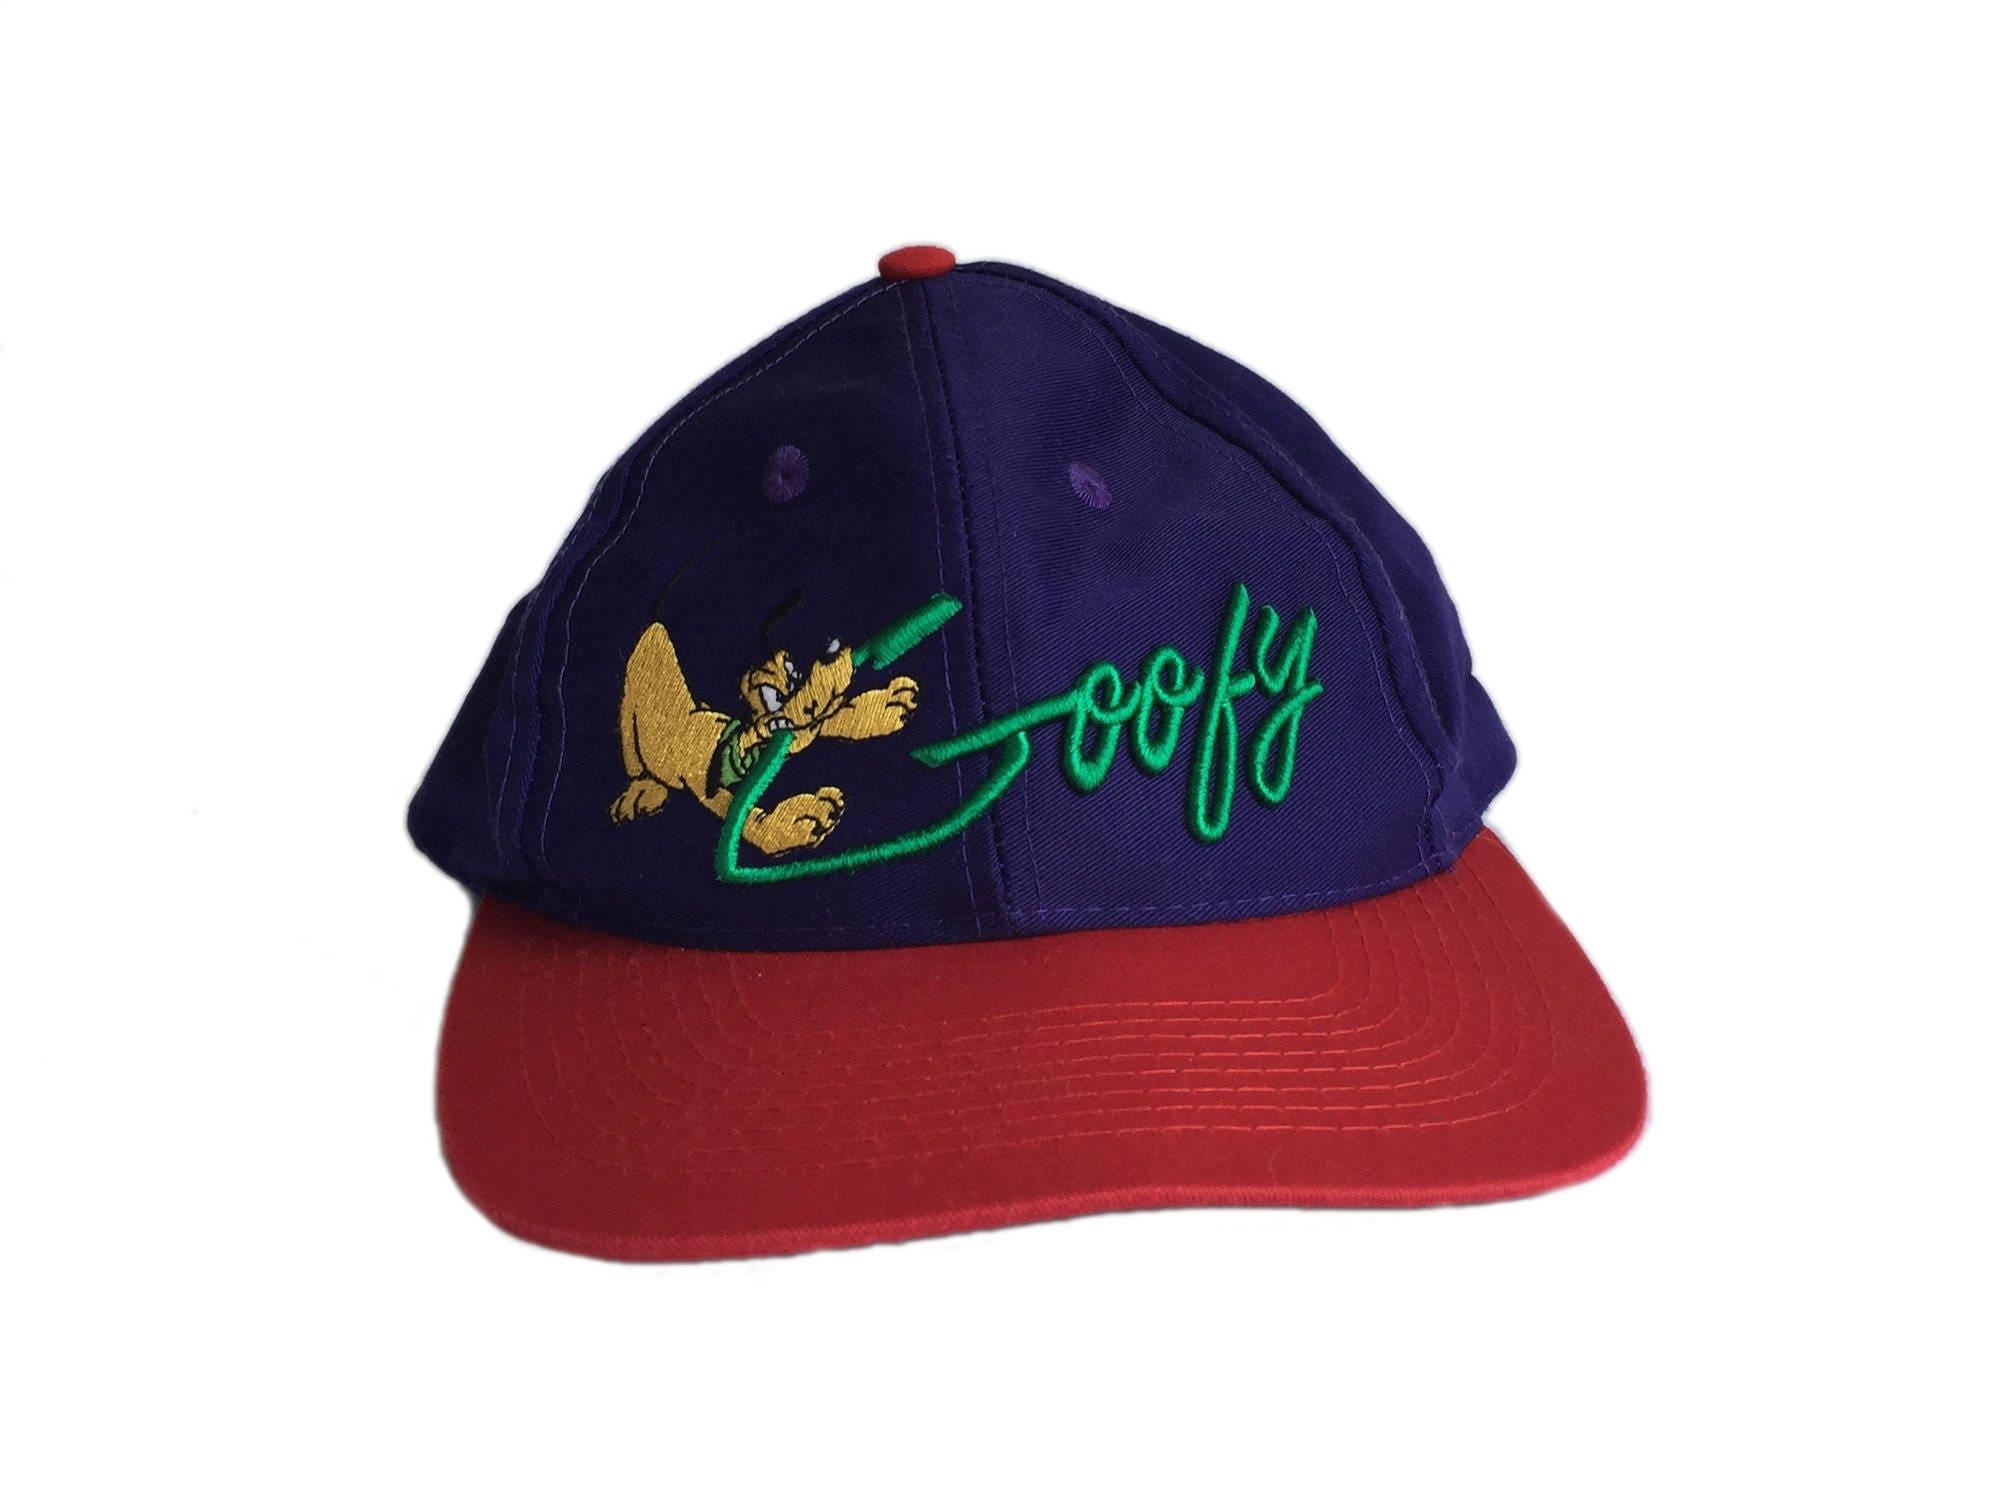 ac6be80e279 Vintage Goofy Pluto Disney Dogs Purple Hat FREE SHIPPING!